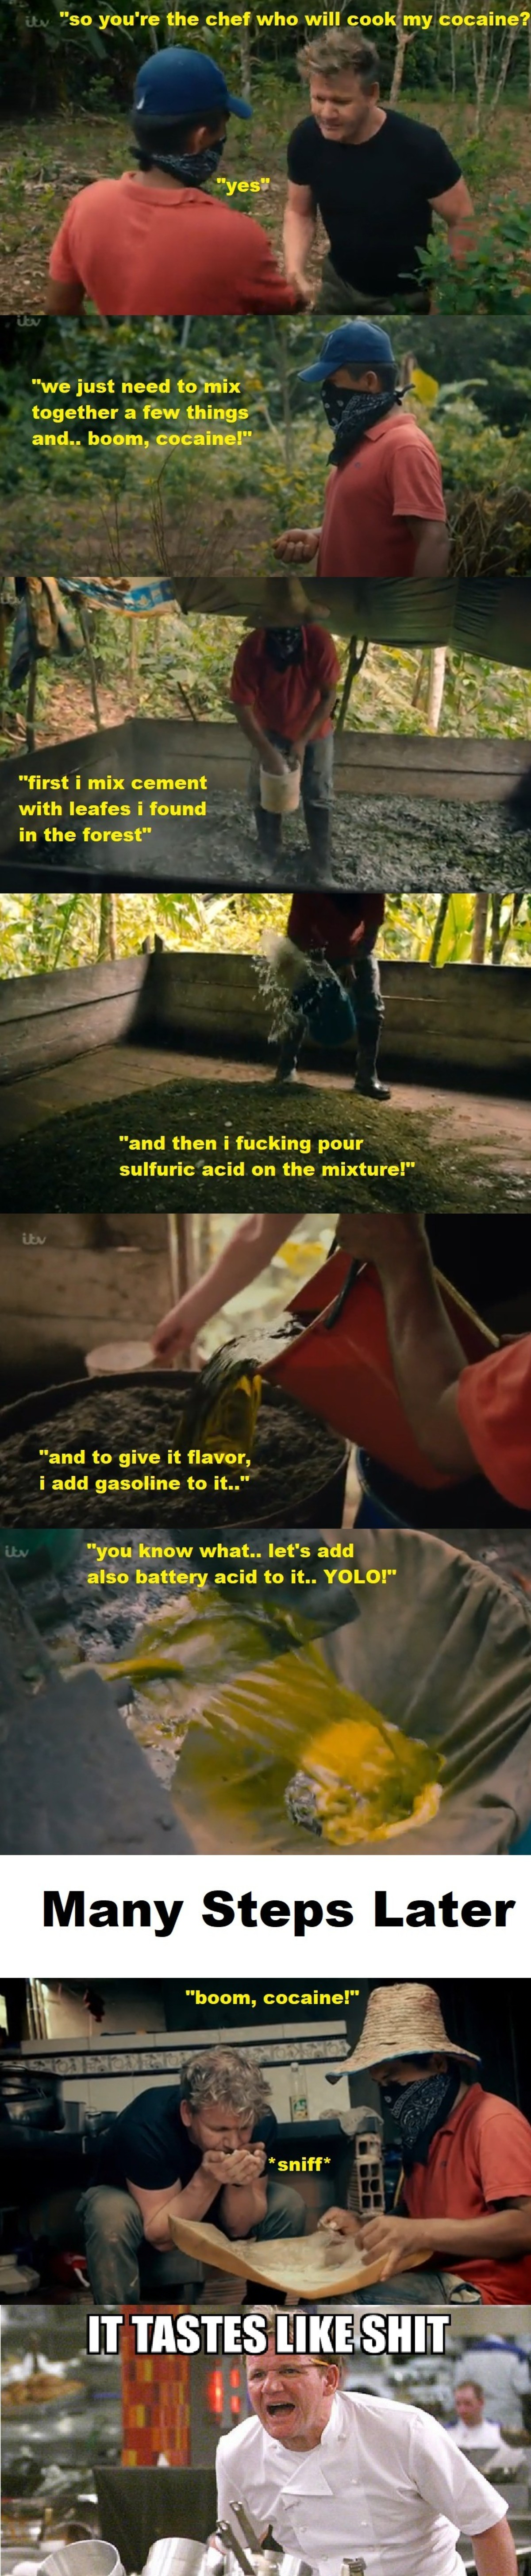 cooking cocaine like a pro... .